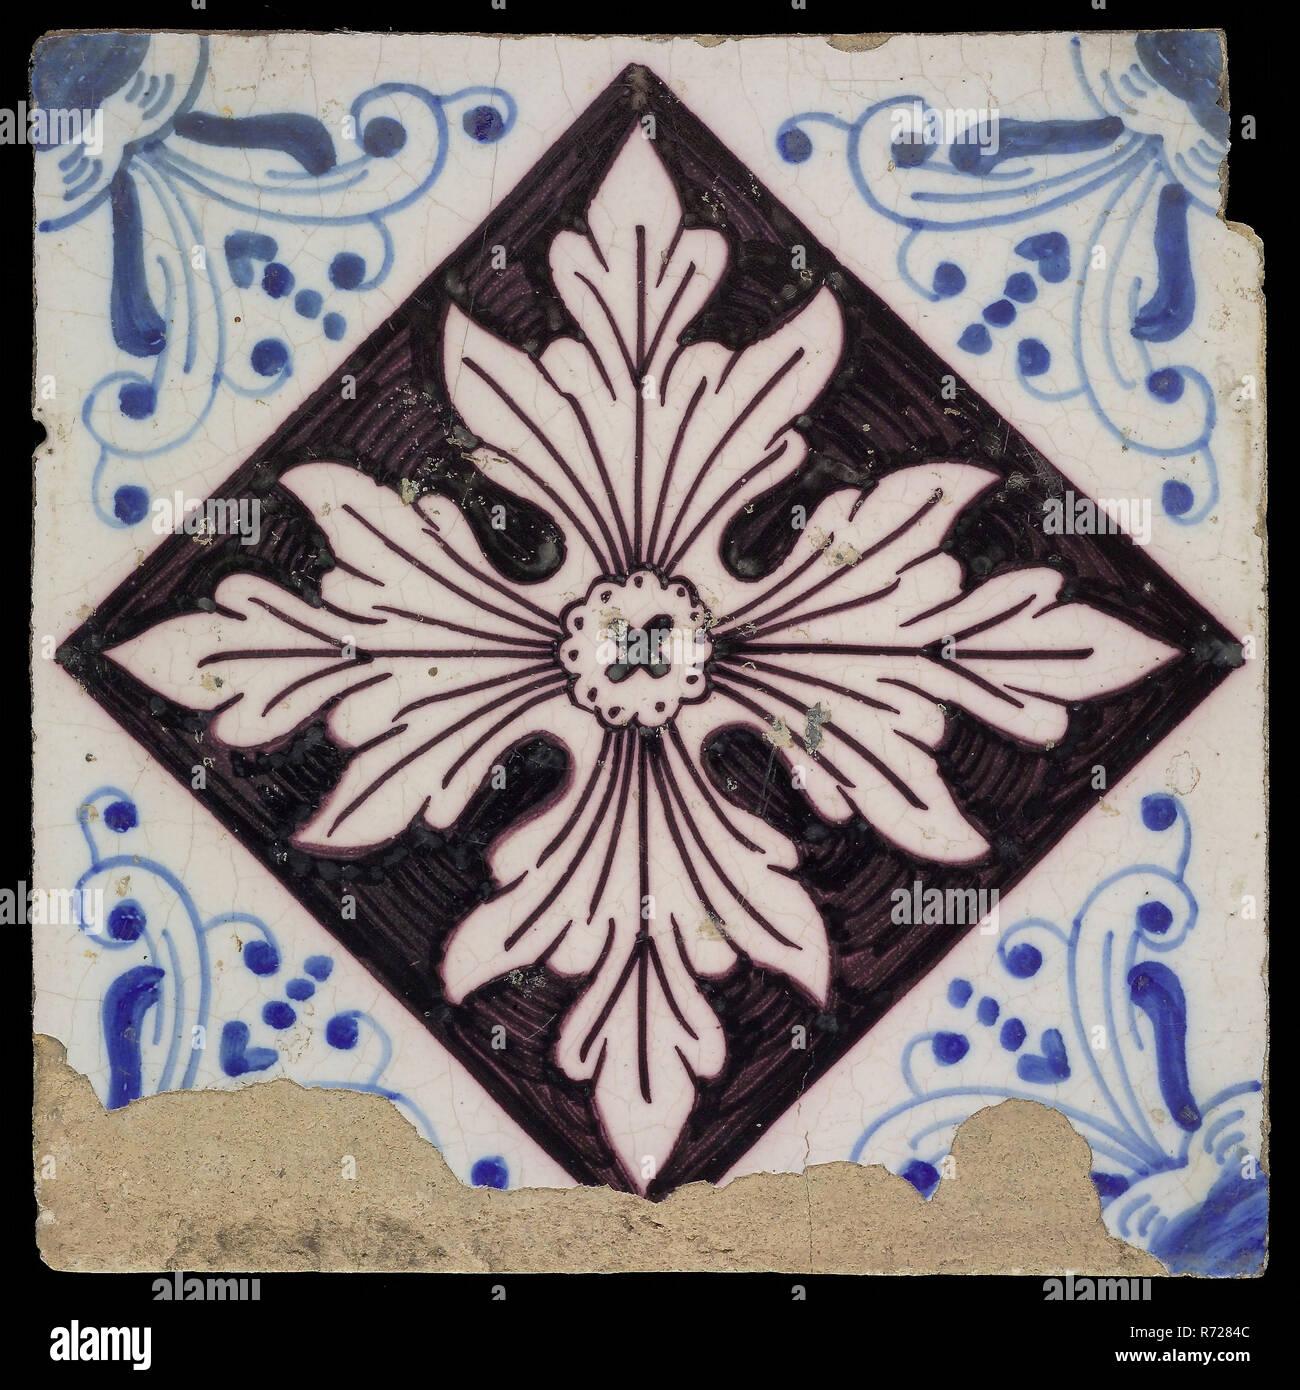 Ornament tile, symmetrical leaf shape, corner motif, ox head, wall tile tile sculpture ceramic earthenware glaze, baked 2x painted glazed Square yellow shard with bevelled side. Purple and blue on white fond tile bakery Piet Heijn - Stock Image